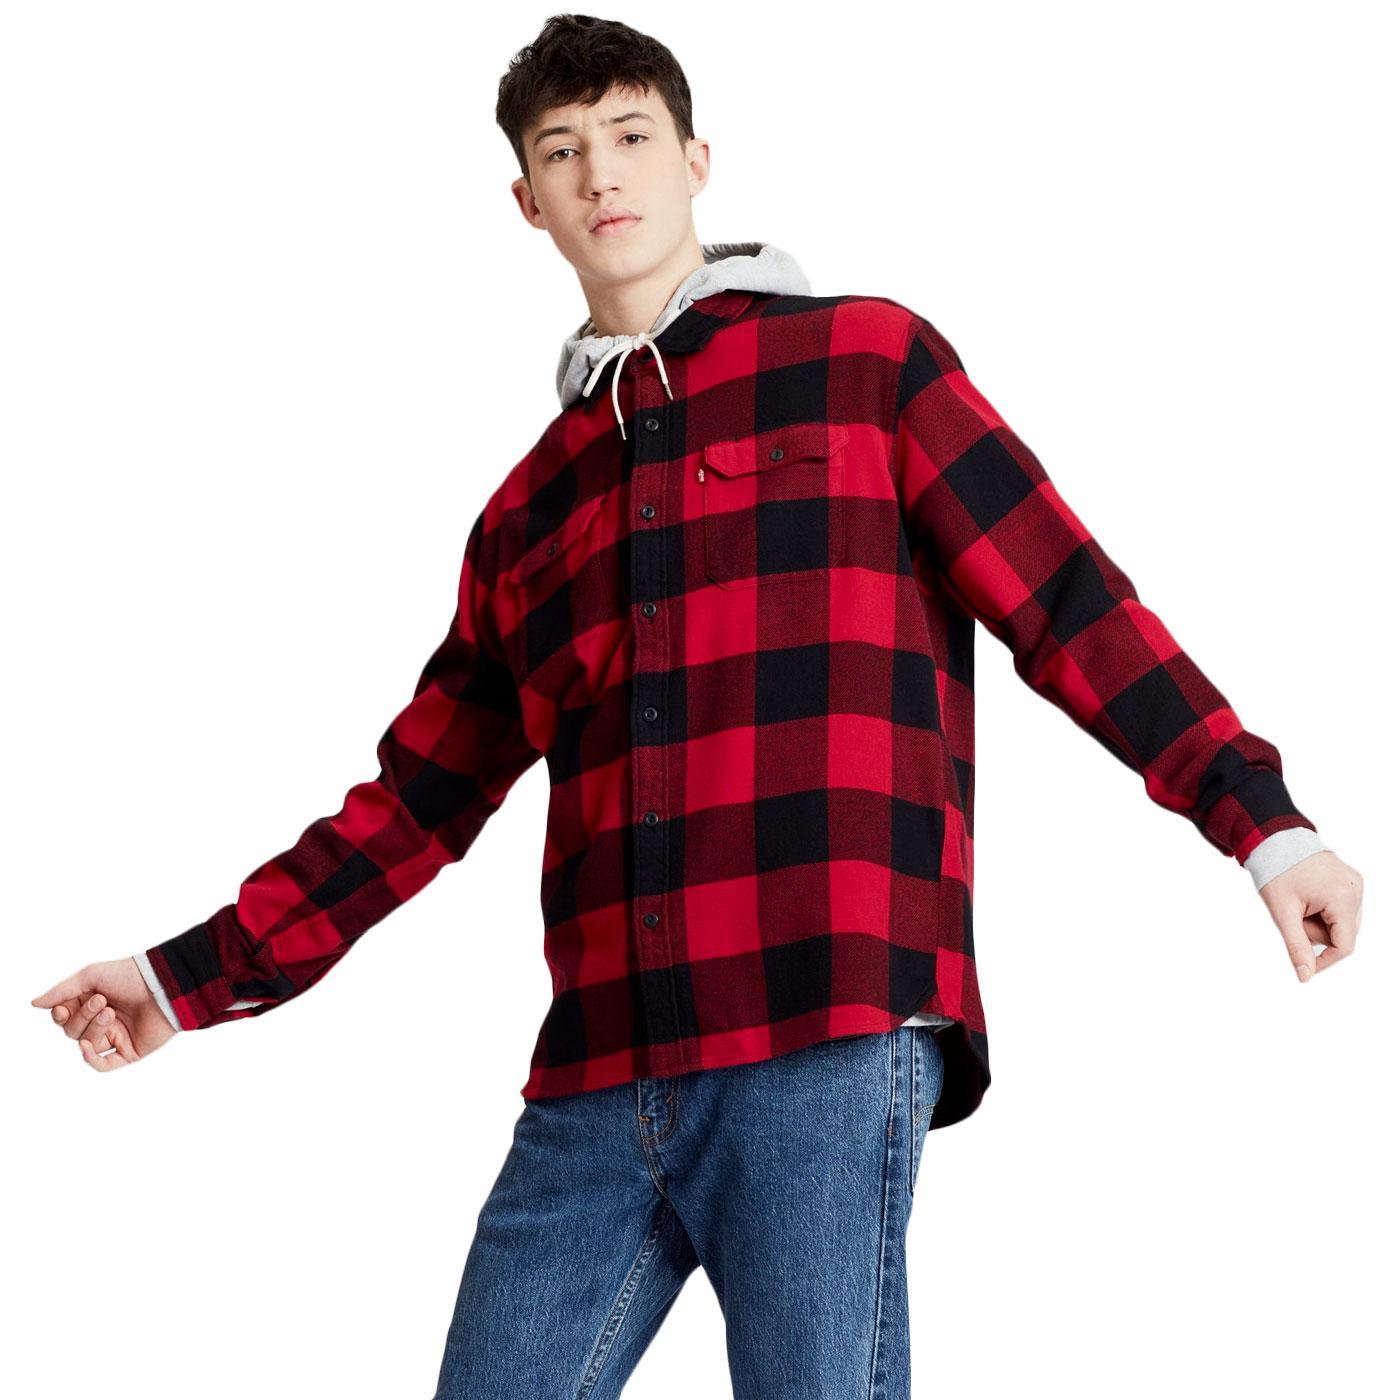 Jackson LEVI'S Retro Plaid Check Worker Shirt (C)